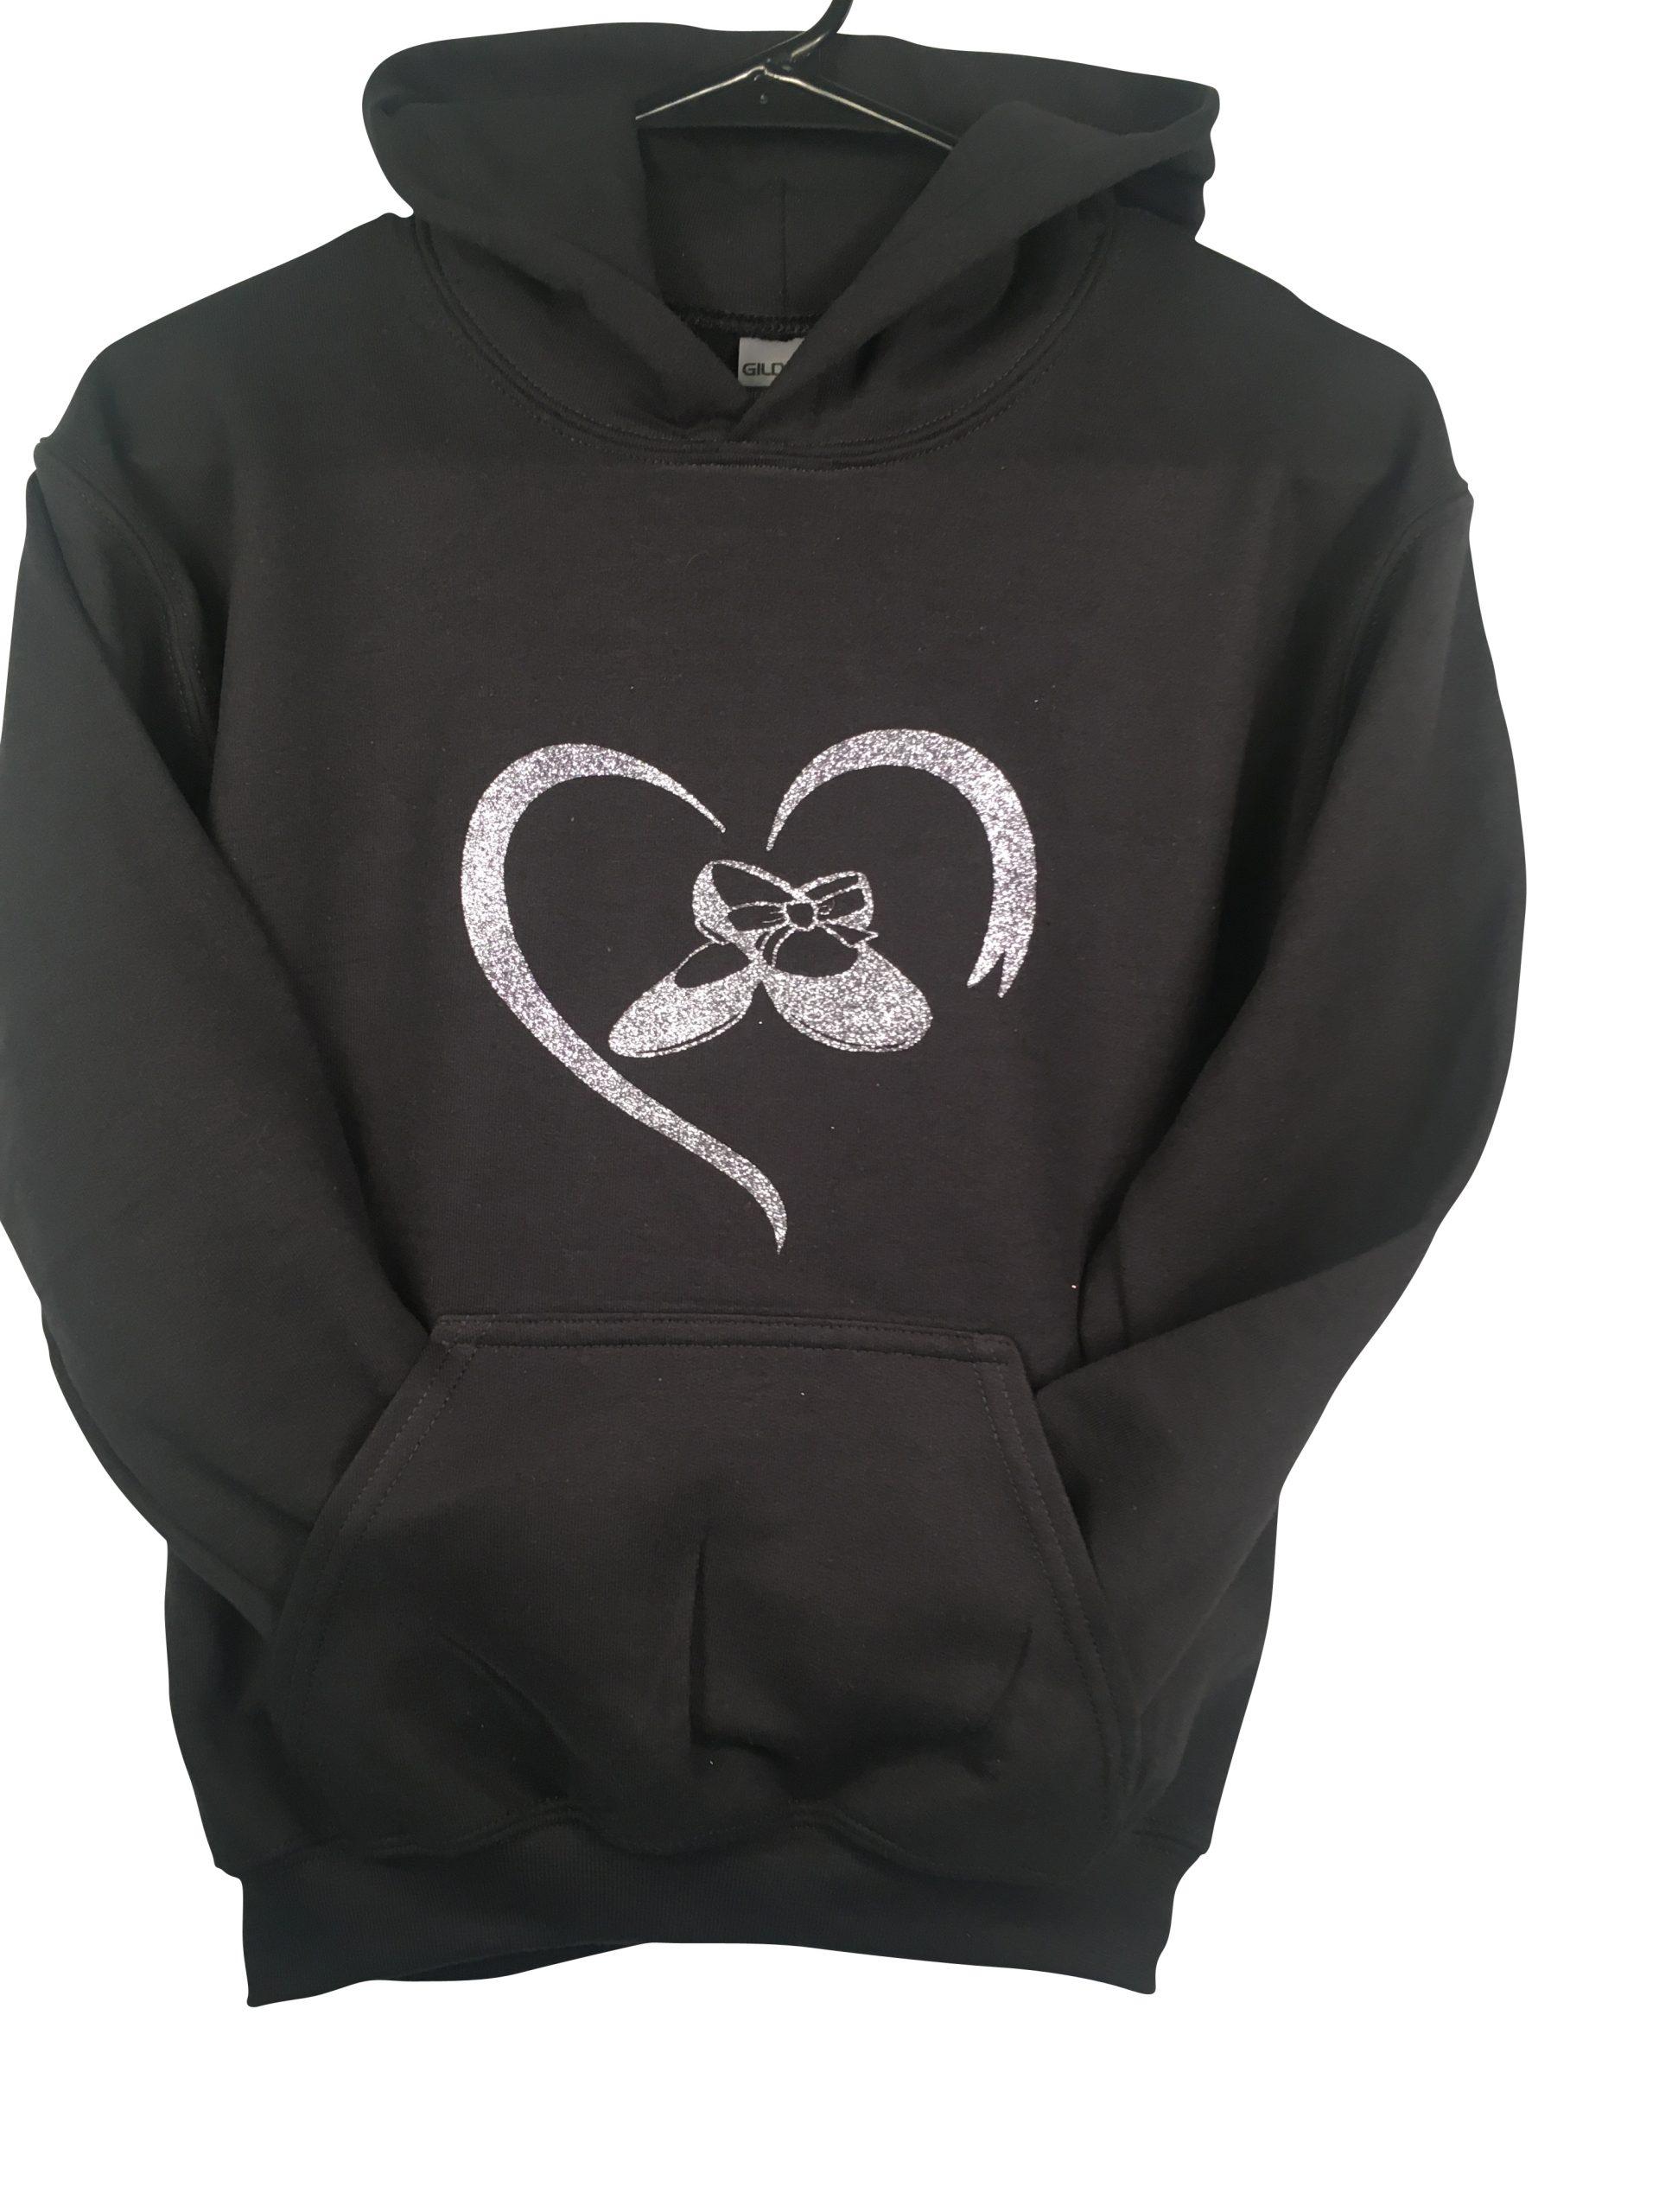 Tap Dance Love Heart Hoodie